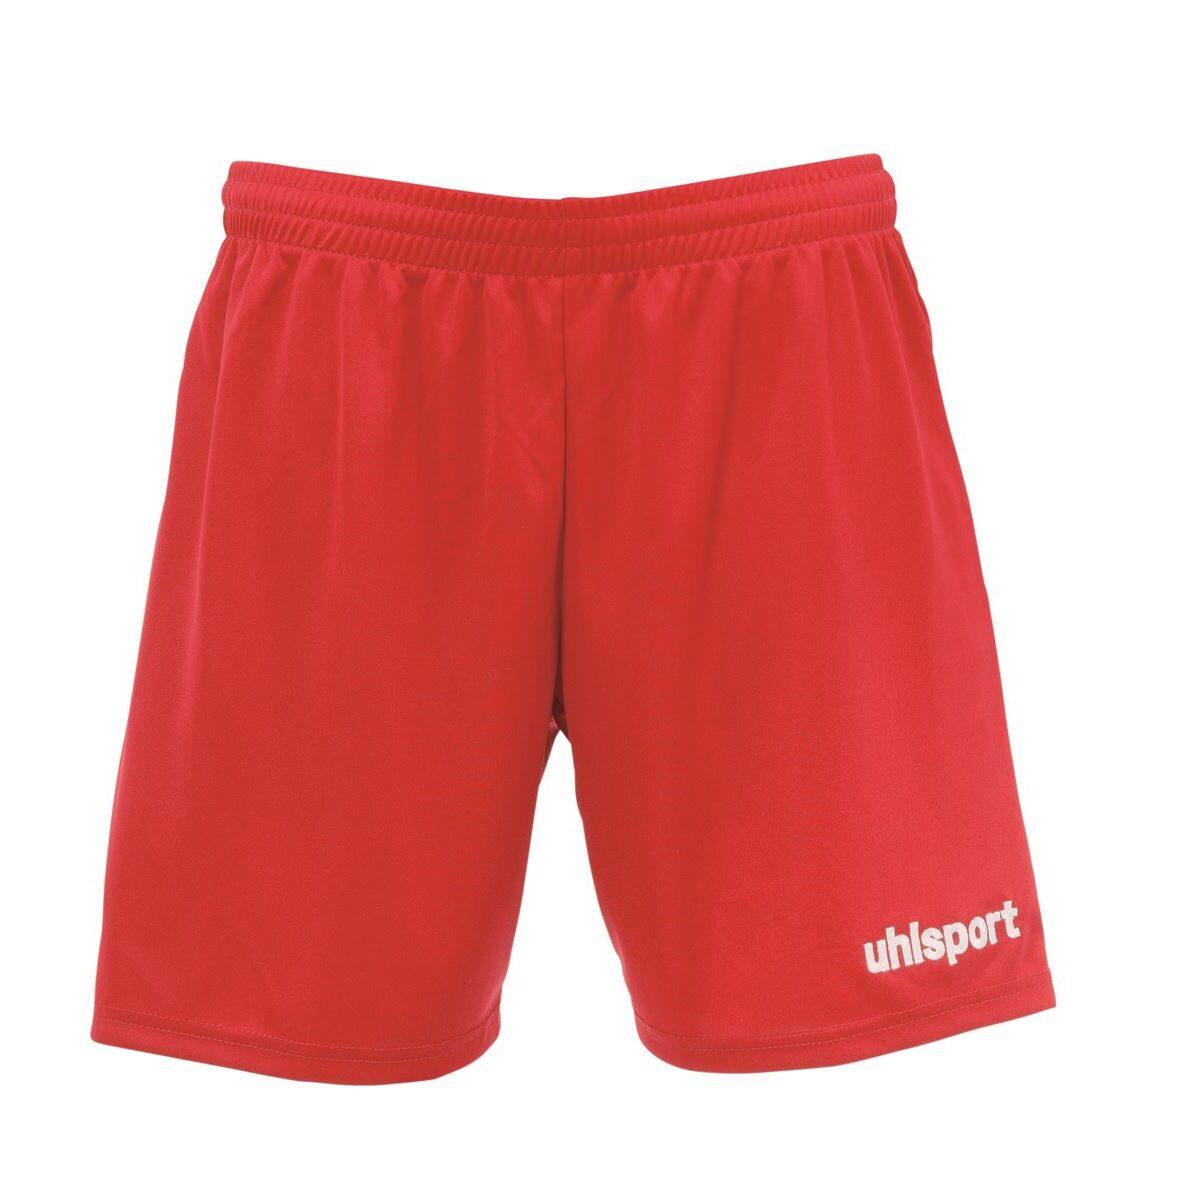 Uhlsport CENTER II WOMENS Short 1003241